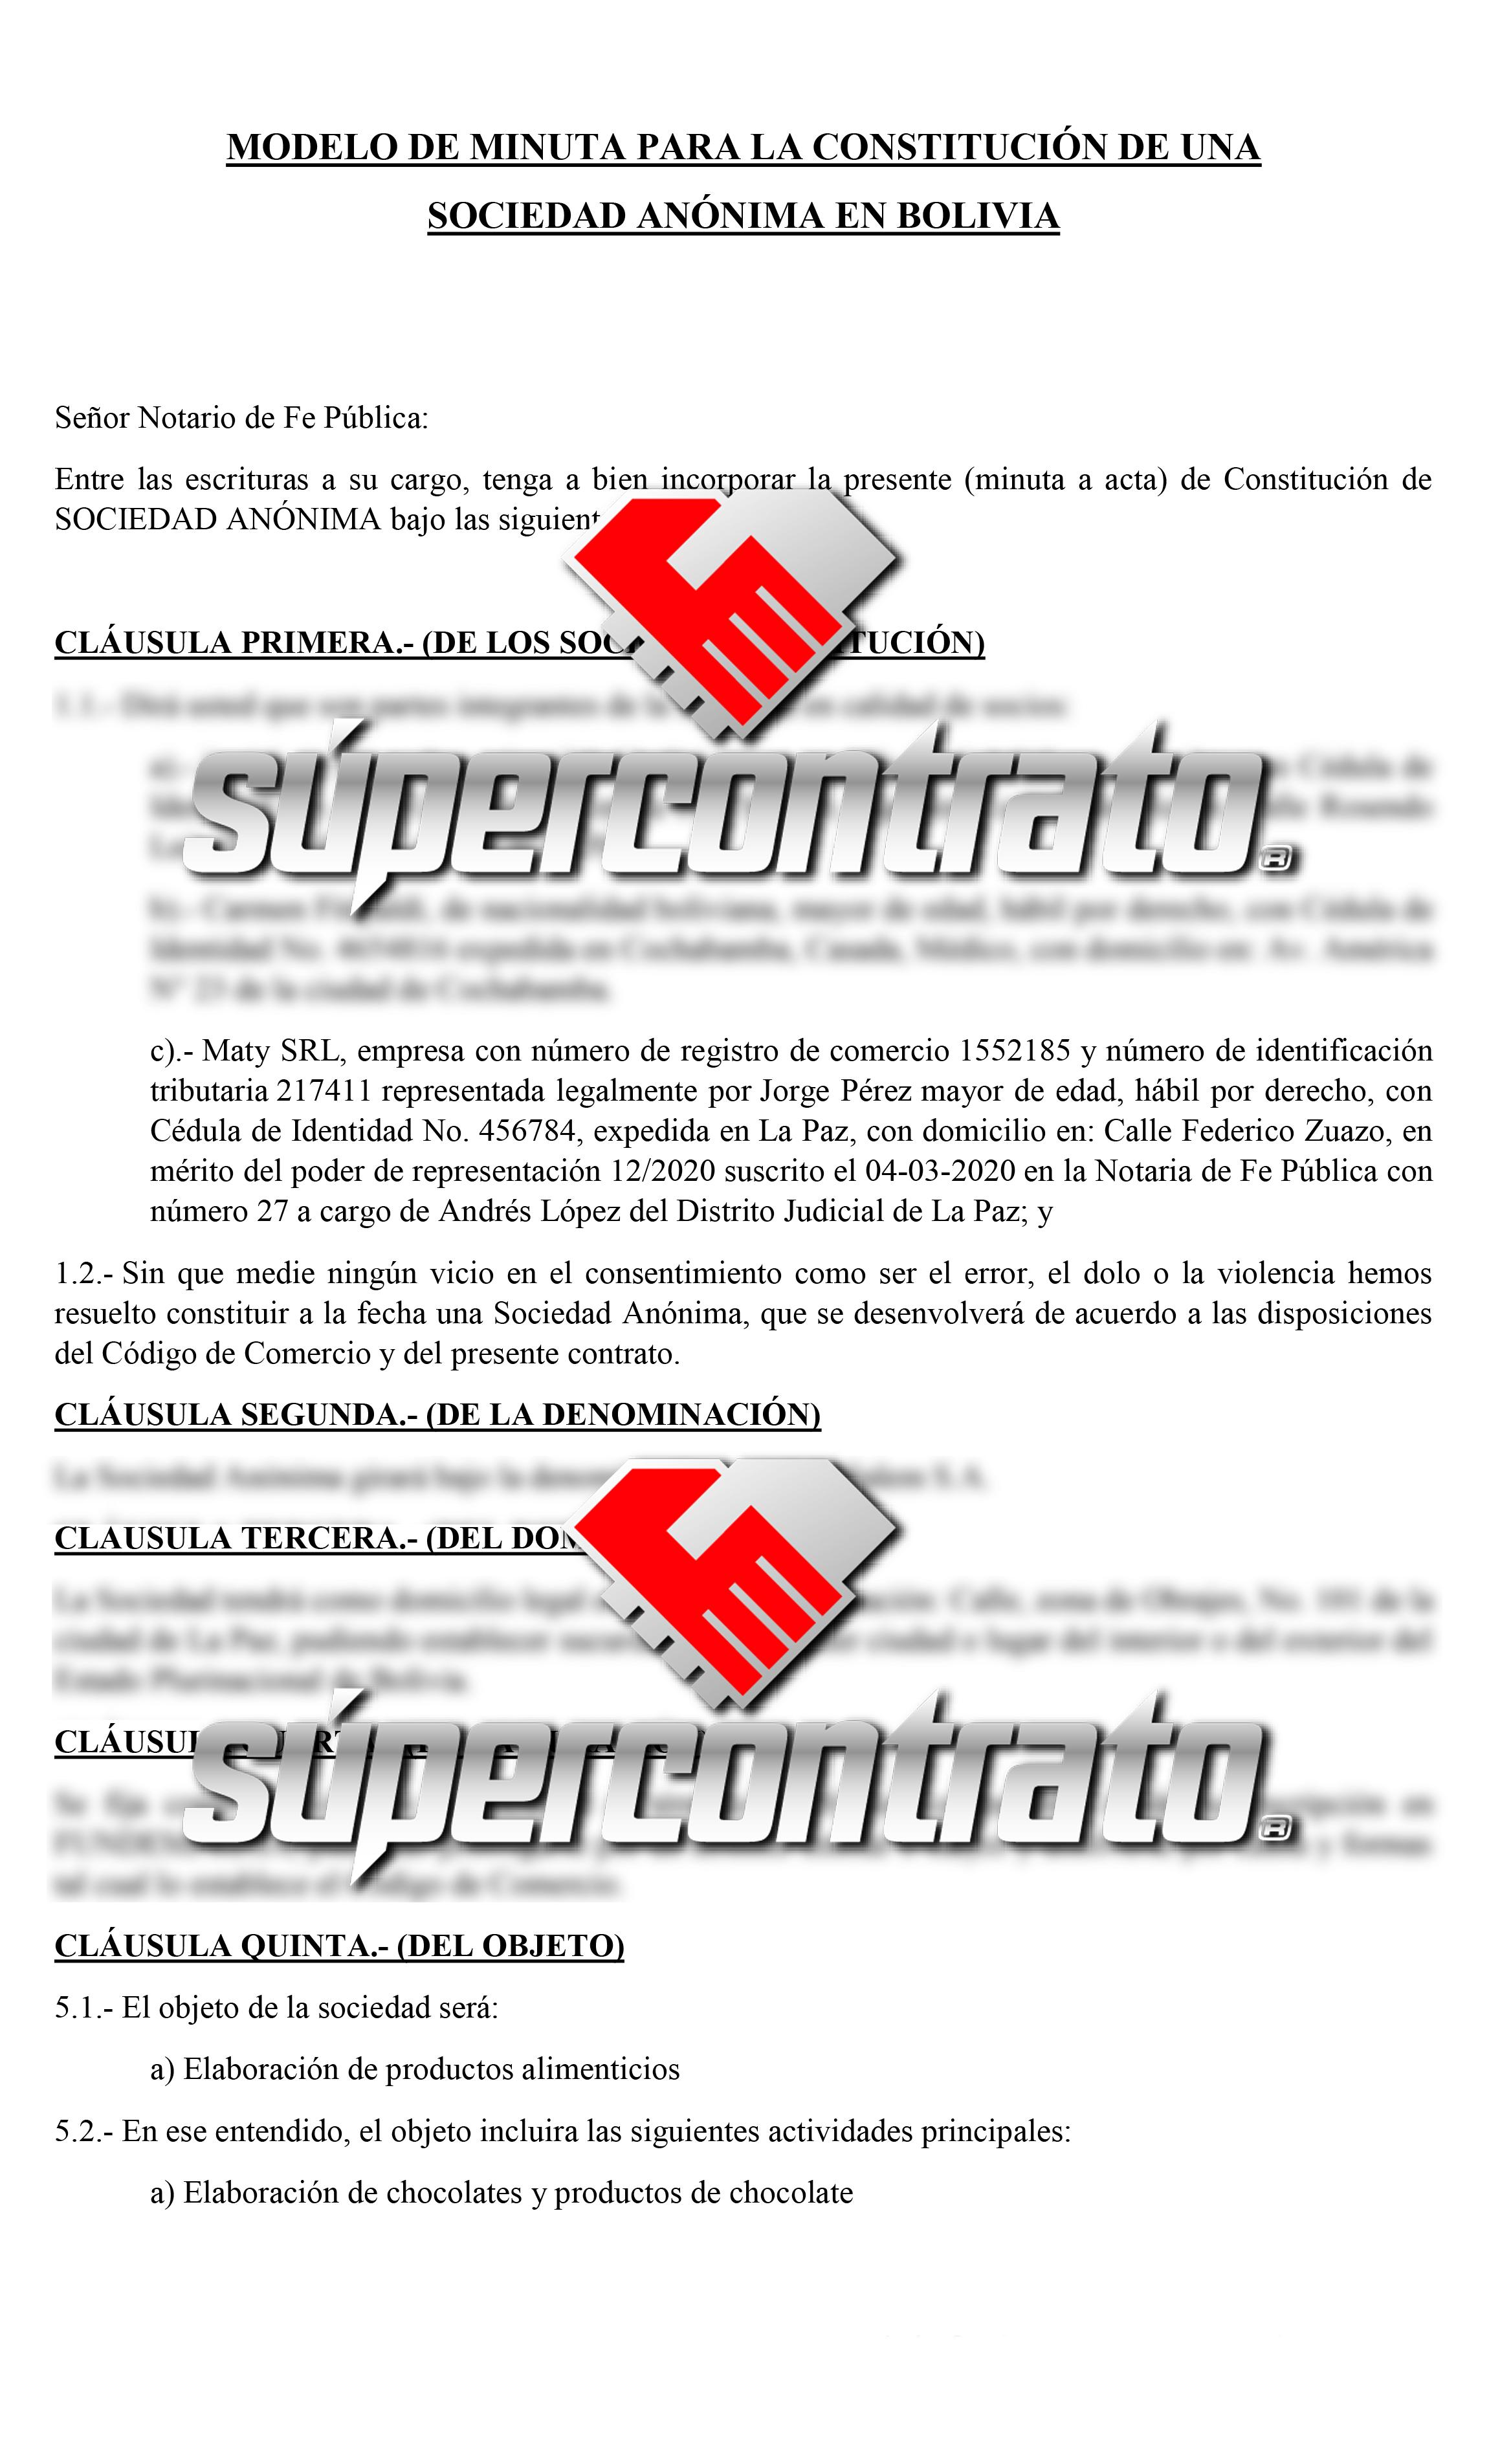 Redacción de contratos